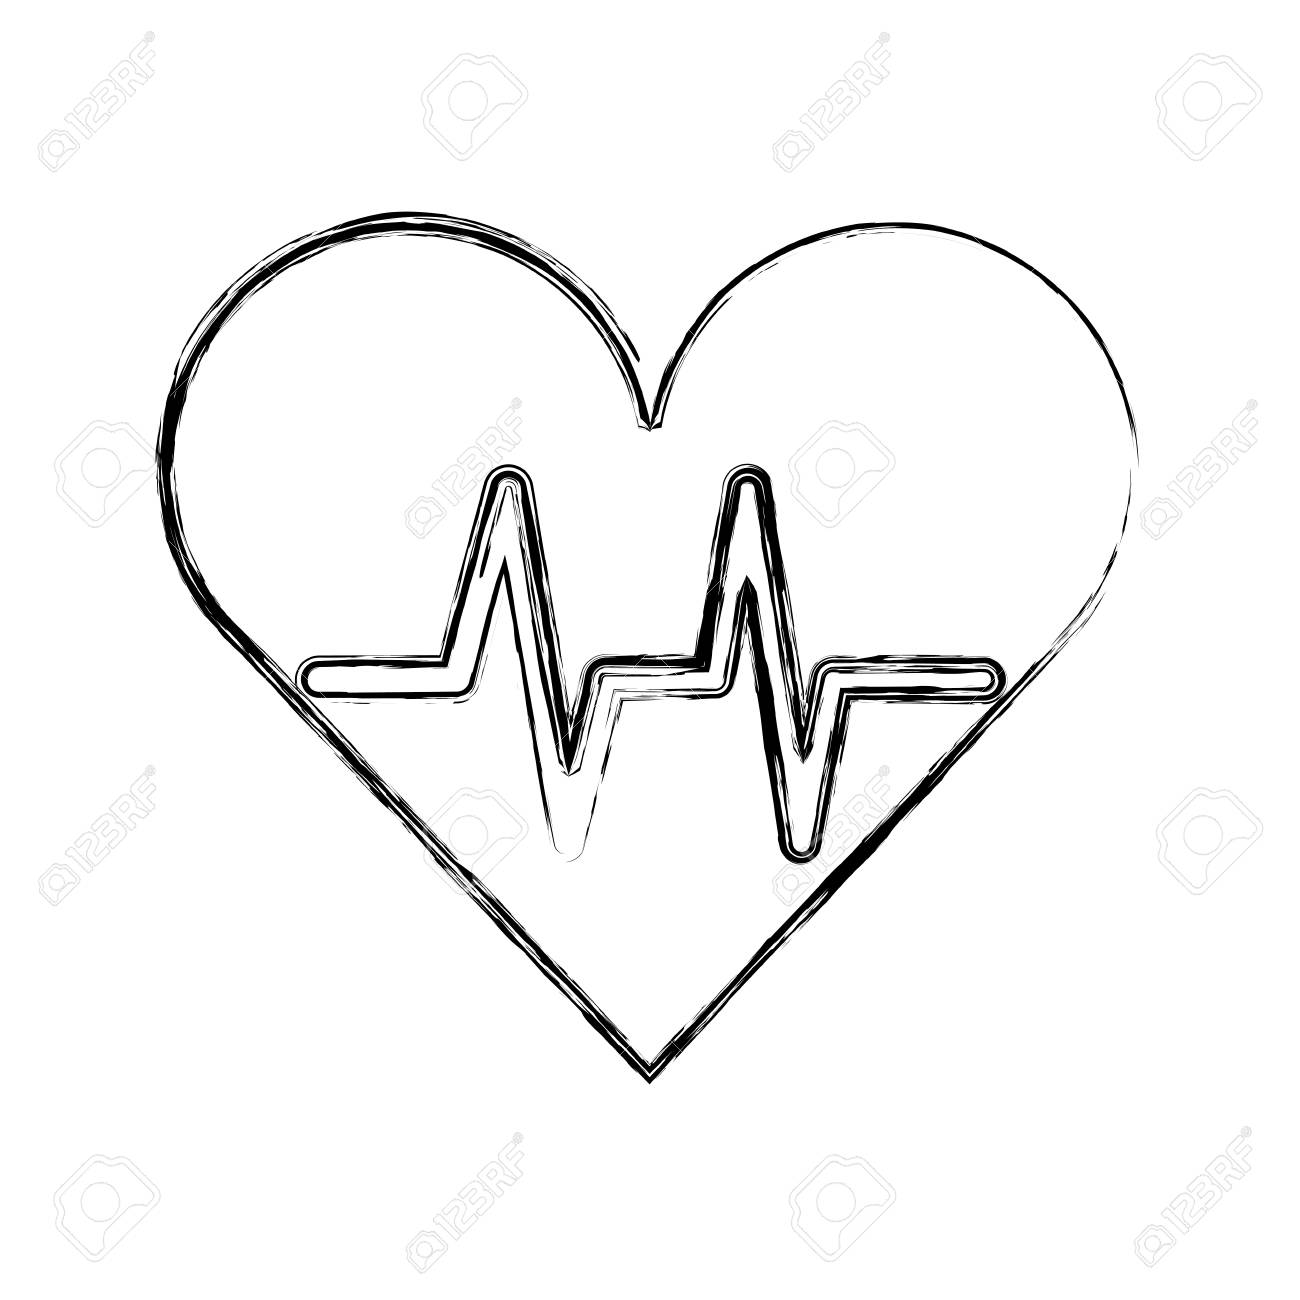 1300x1300 Sketch Draw Heart Beat Pulse Cartooon Vector Graphic Design